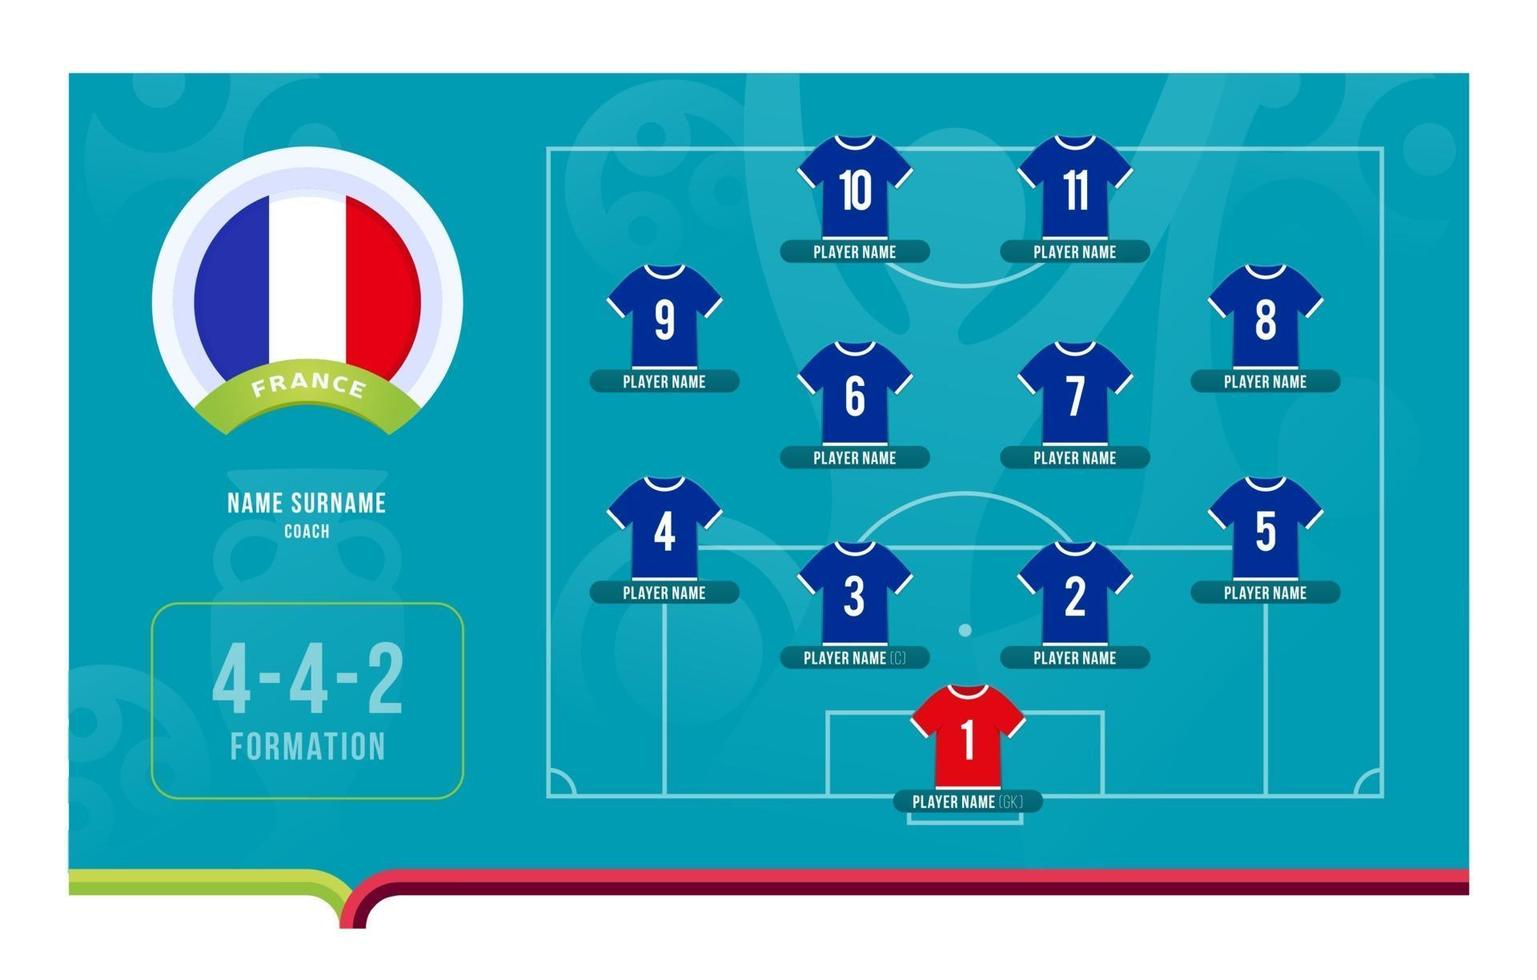 France line-up Football tournament final stage vector illustration